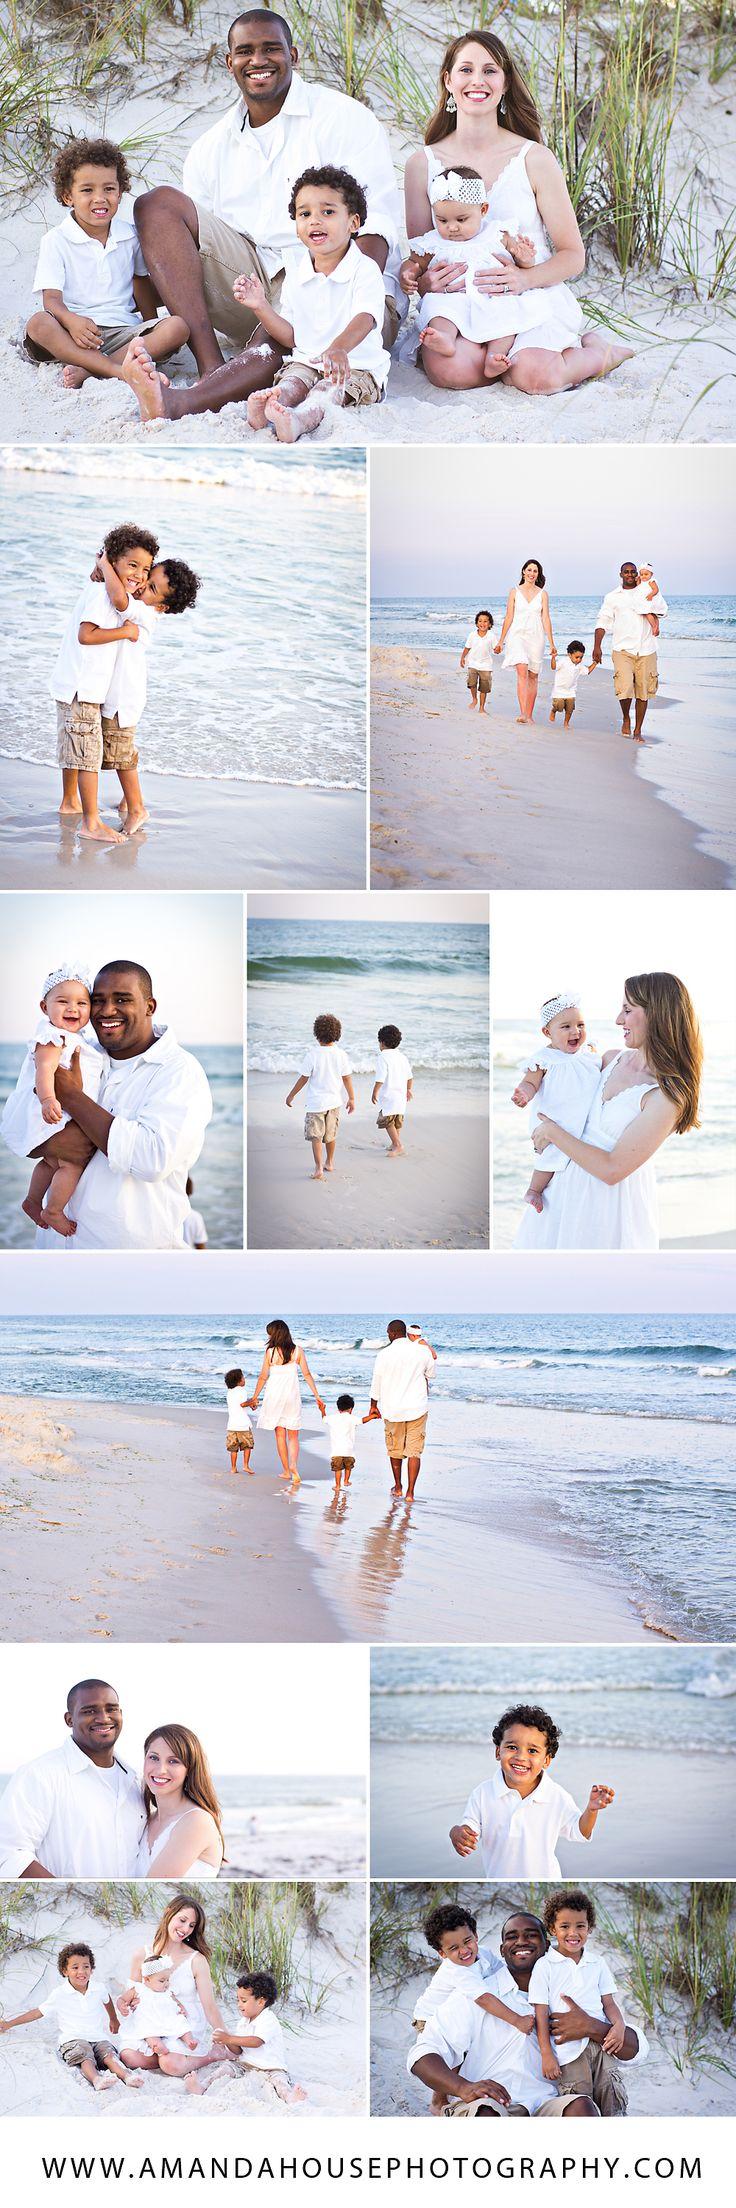 Family Beach Session Ideas | Amanda House Photography